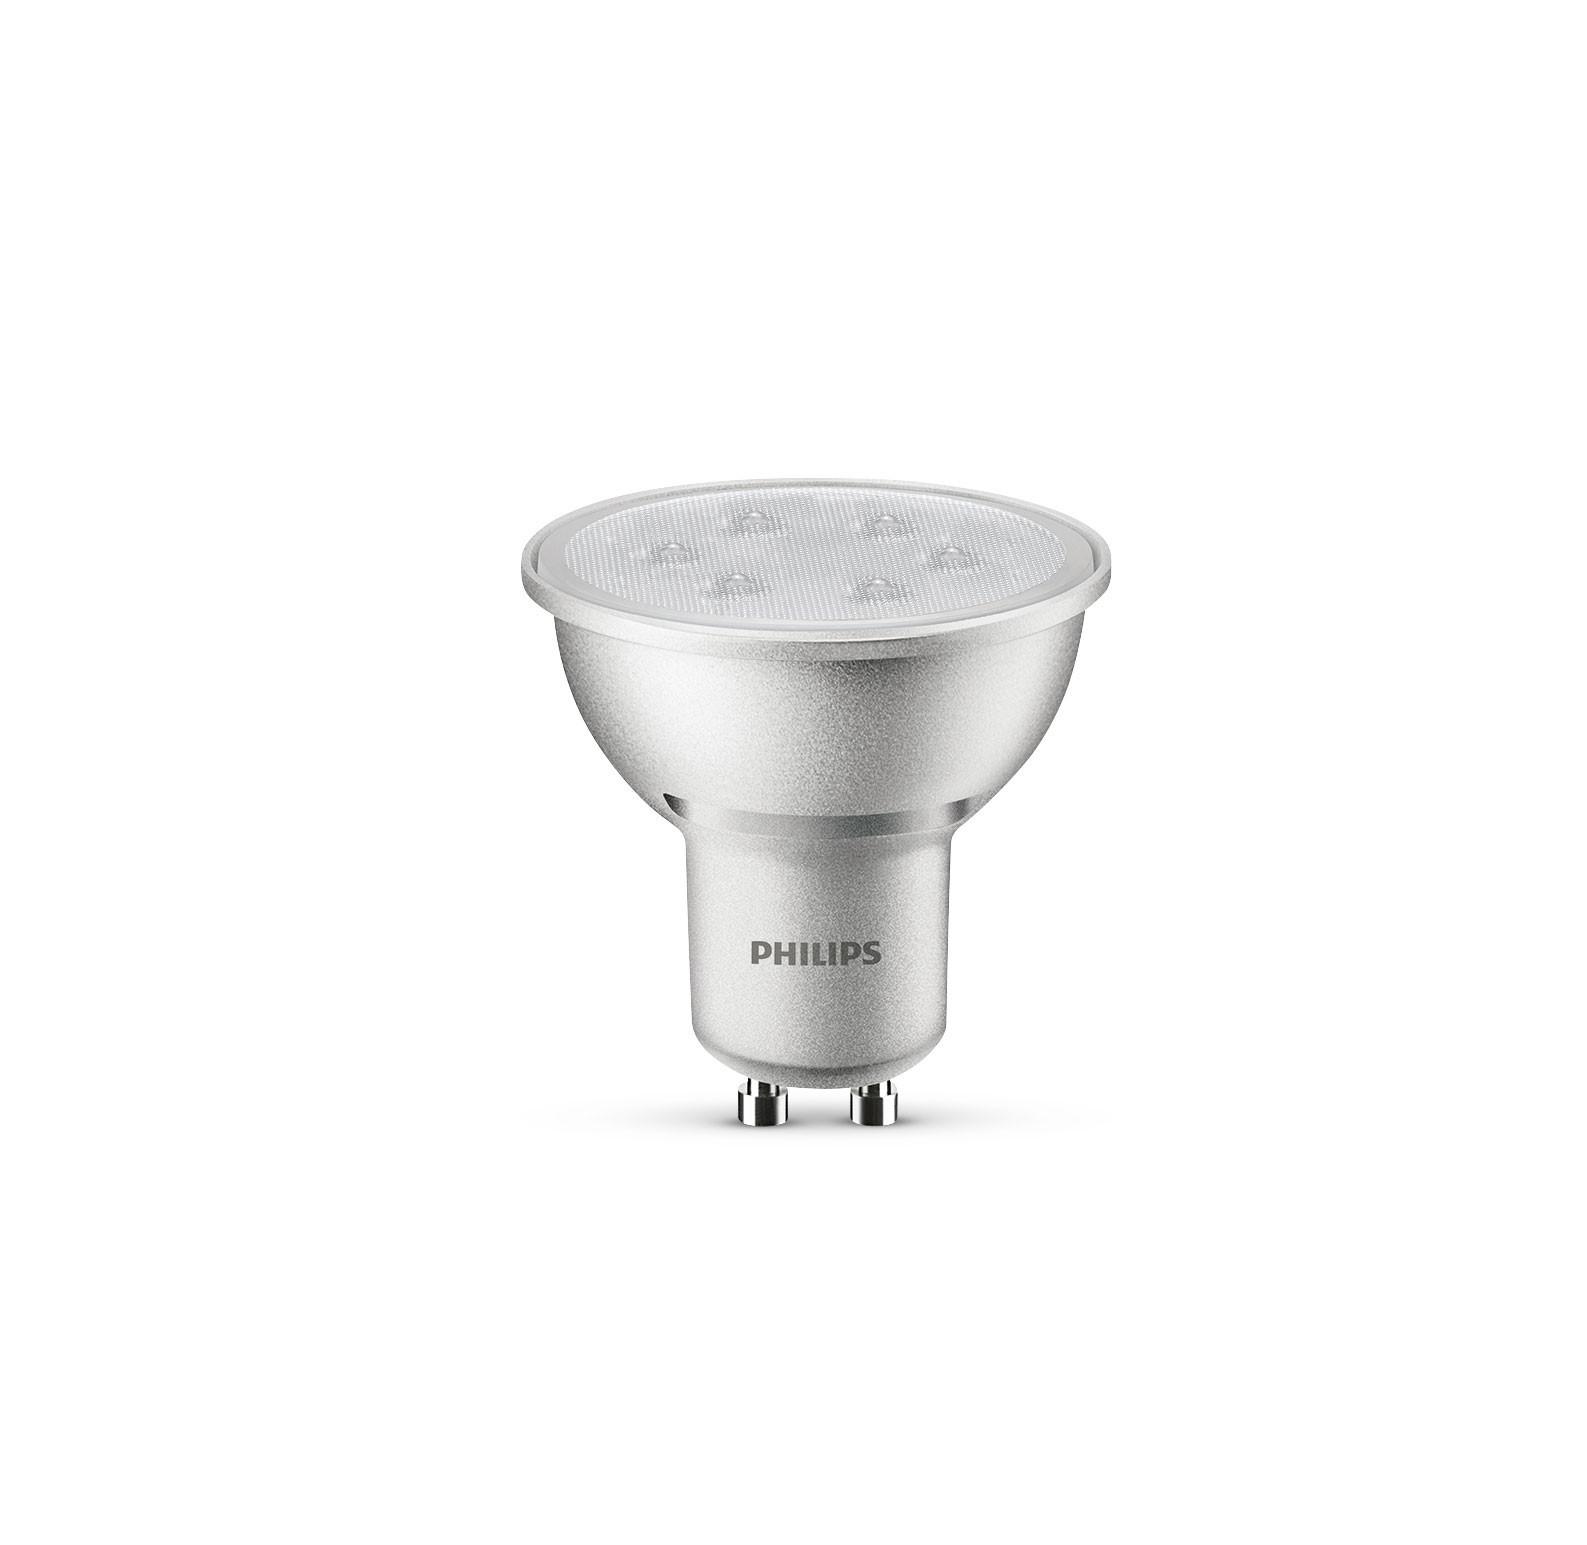 Philips LED Reflektorlampe GU10 4 Watt dimmbar Bild 1